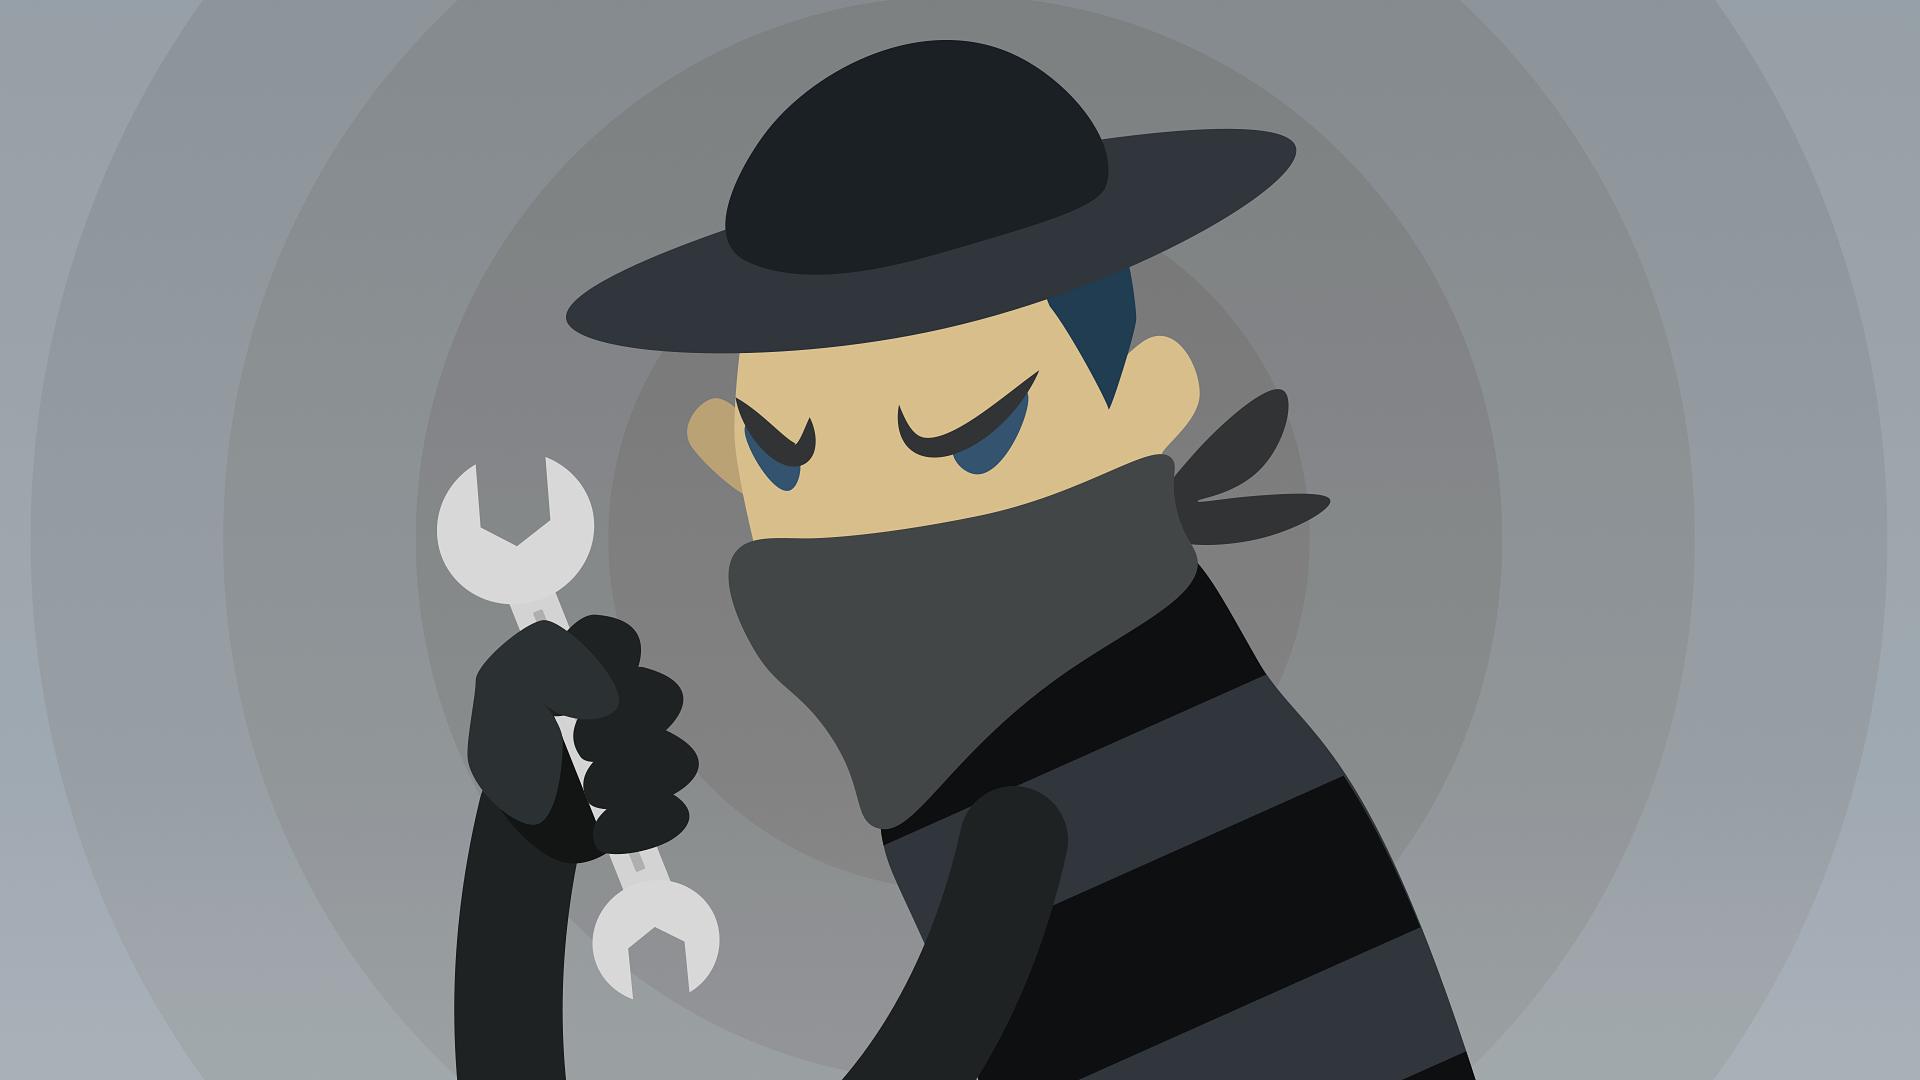 Вебинар Взлом и нападение: аудит веб-приложений и техники атаки фото